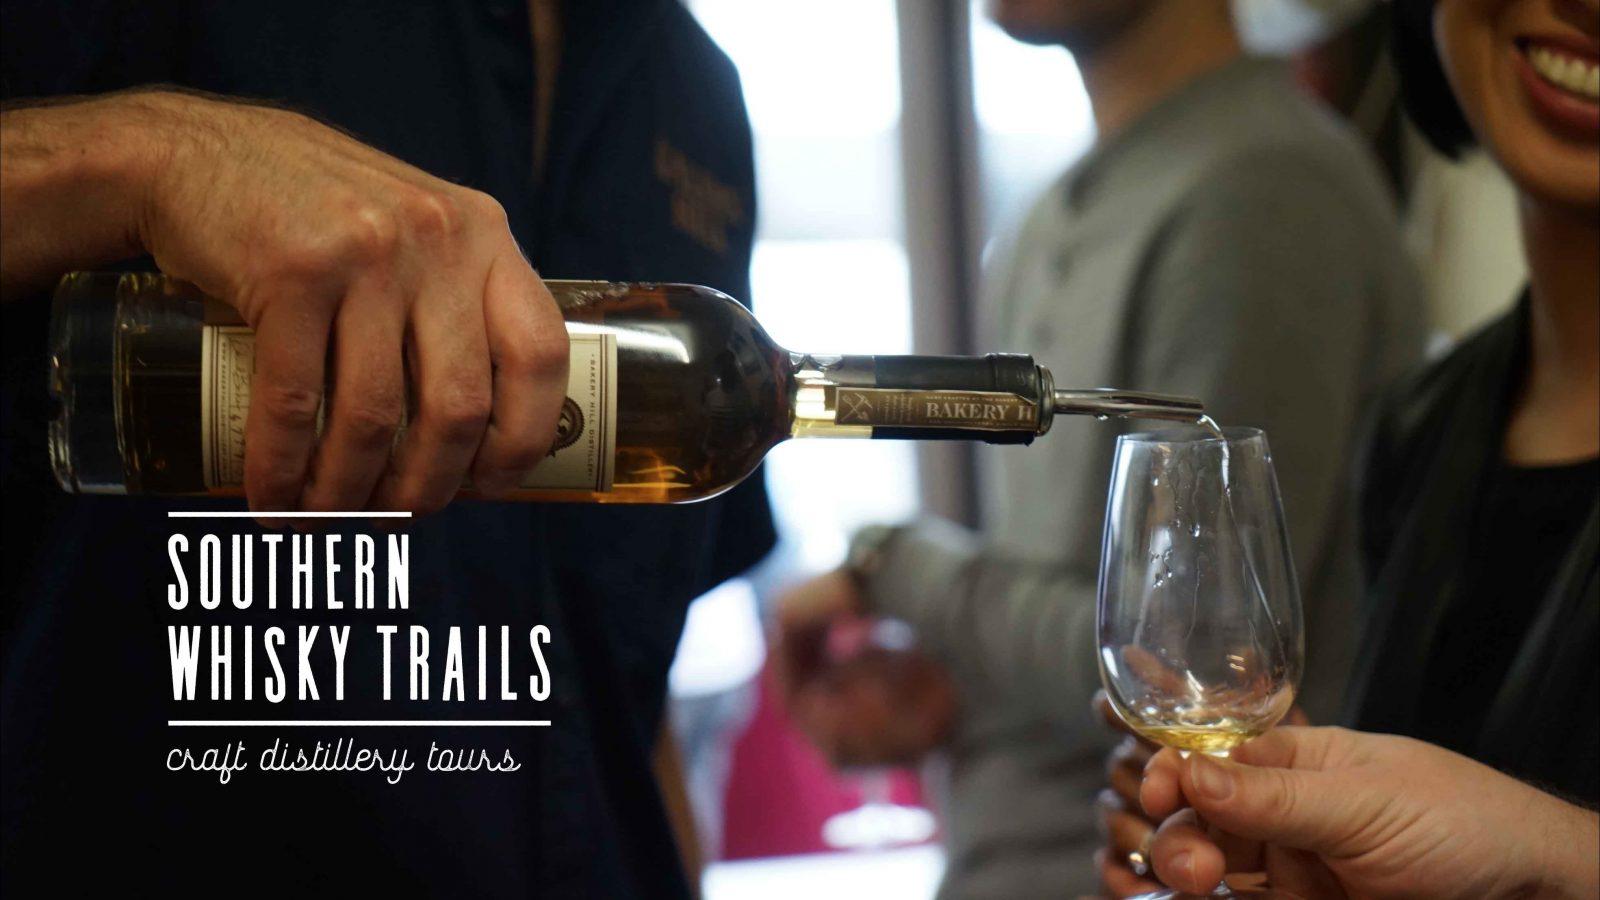 Whisky tasting at Bakery Hill distillery